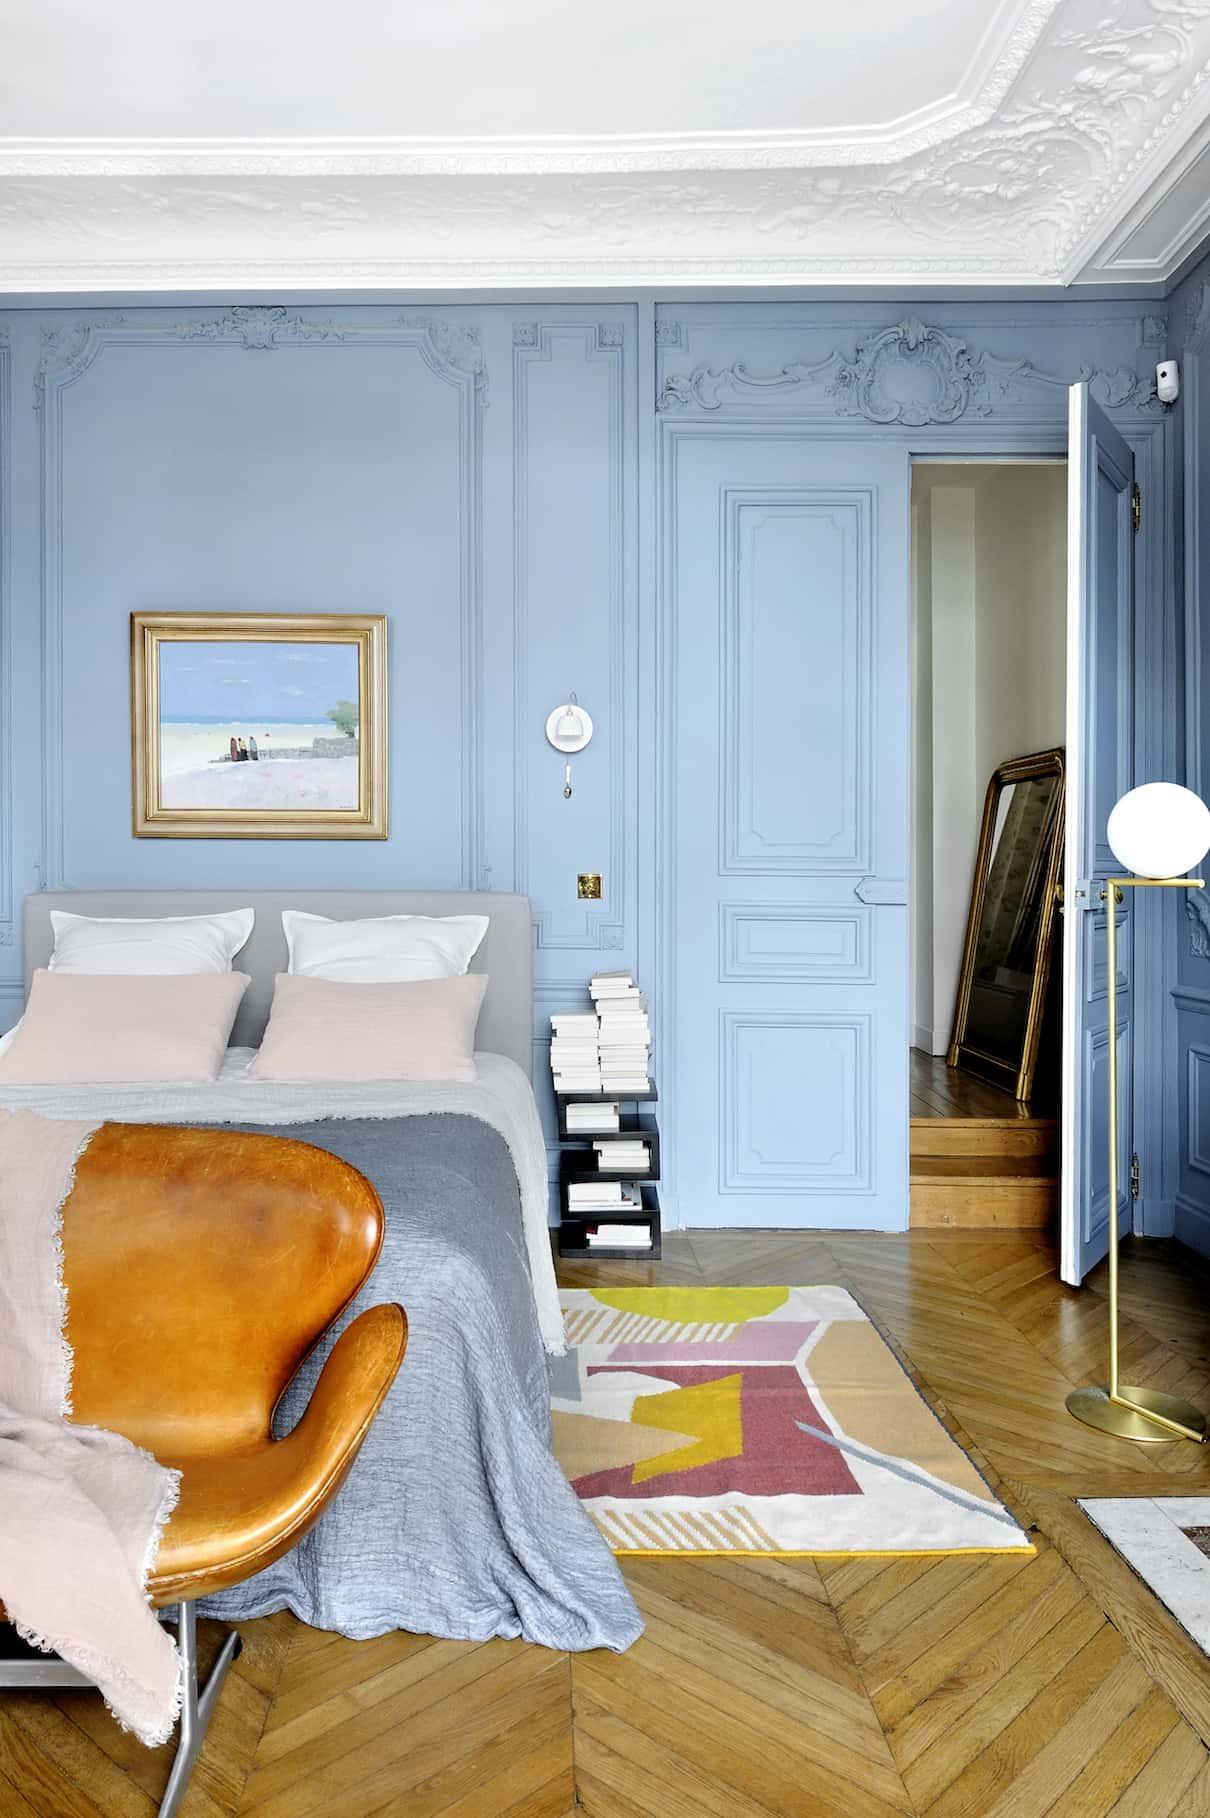 peinture appartement haussmannien lw03 jornalagora. Black Bedroom Furniture Sets. Home Design Ideas